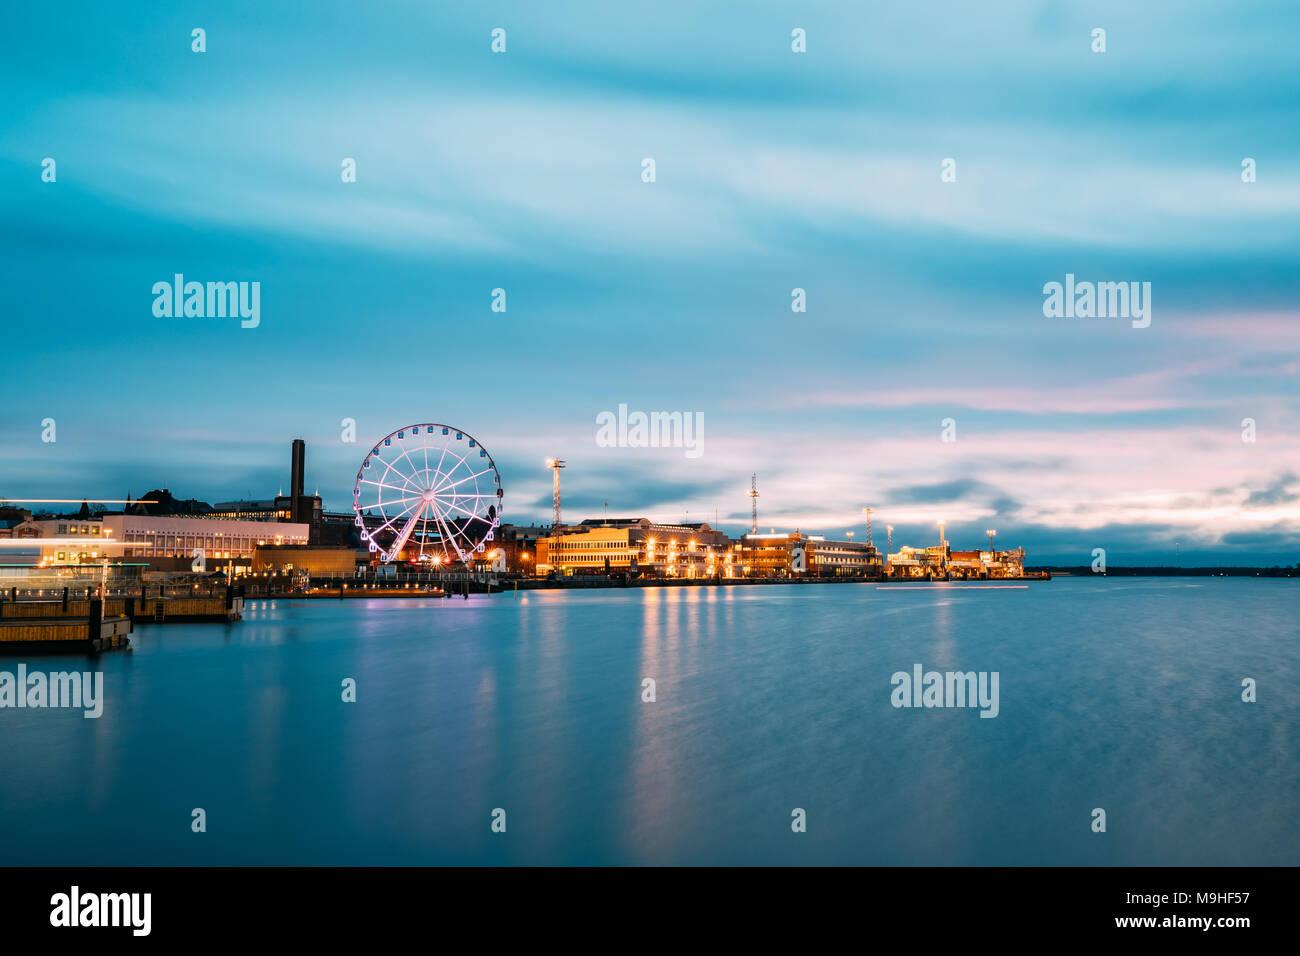 Helsinki, Finland. View Of Embankment With Ferris Wheel In Evening Night Illuminations. - Stock Image